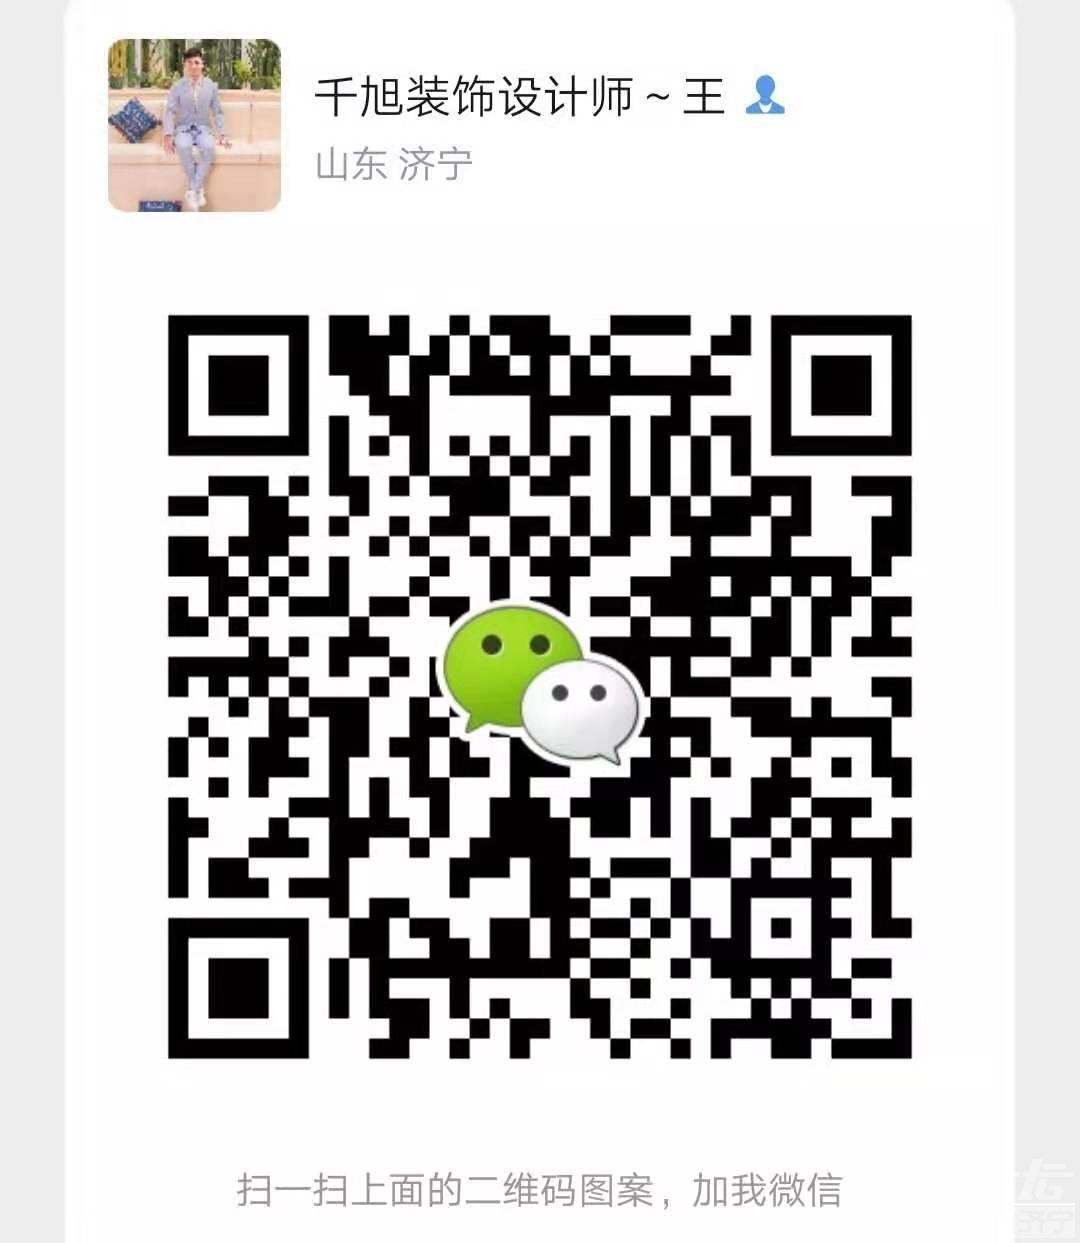 204733n1kw8f9kk48r1ijb.jpg